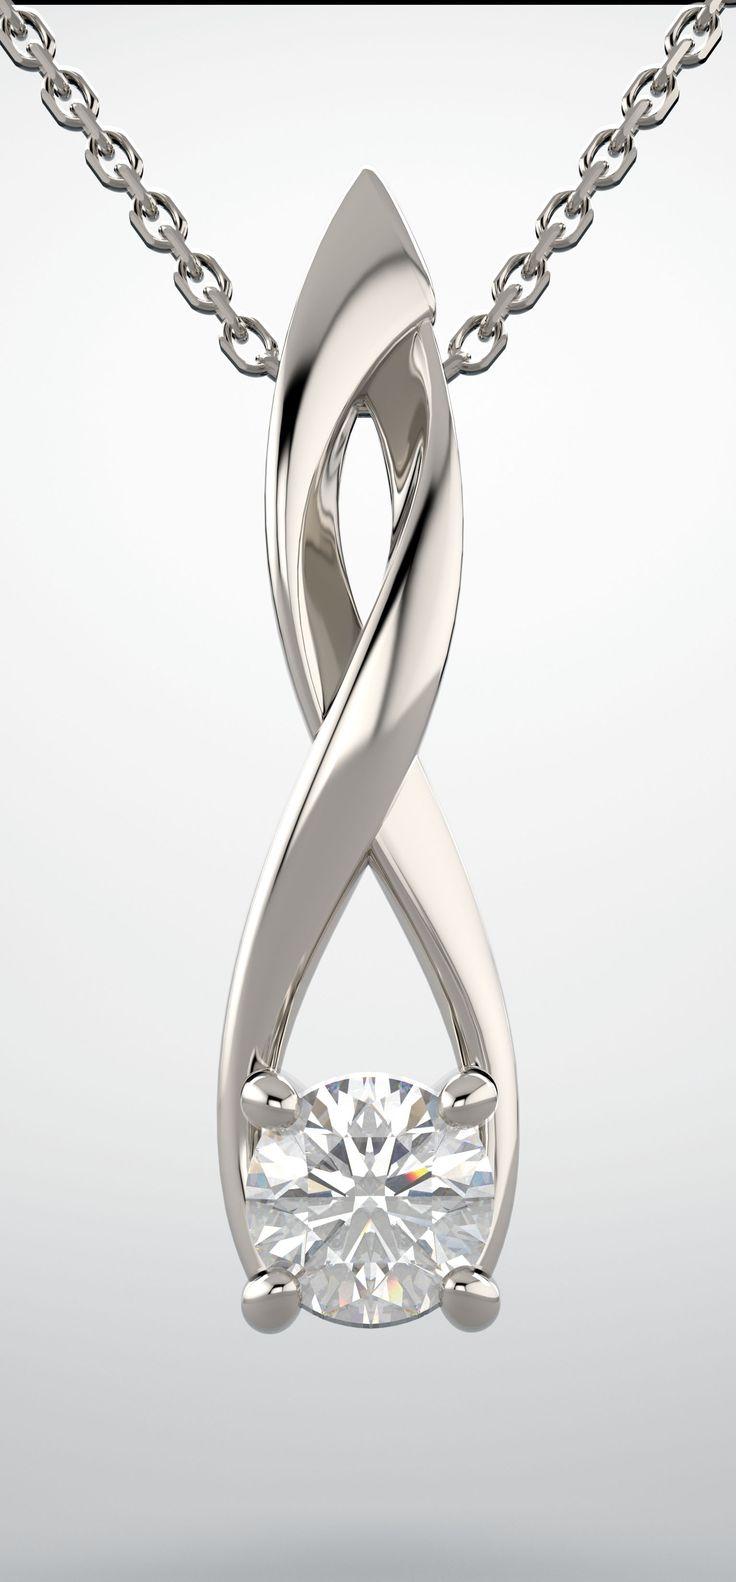 Infinity-inspired diamond pendant Item #86604